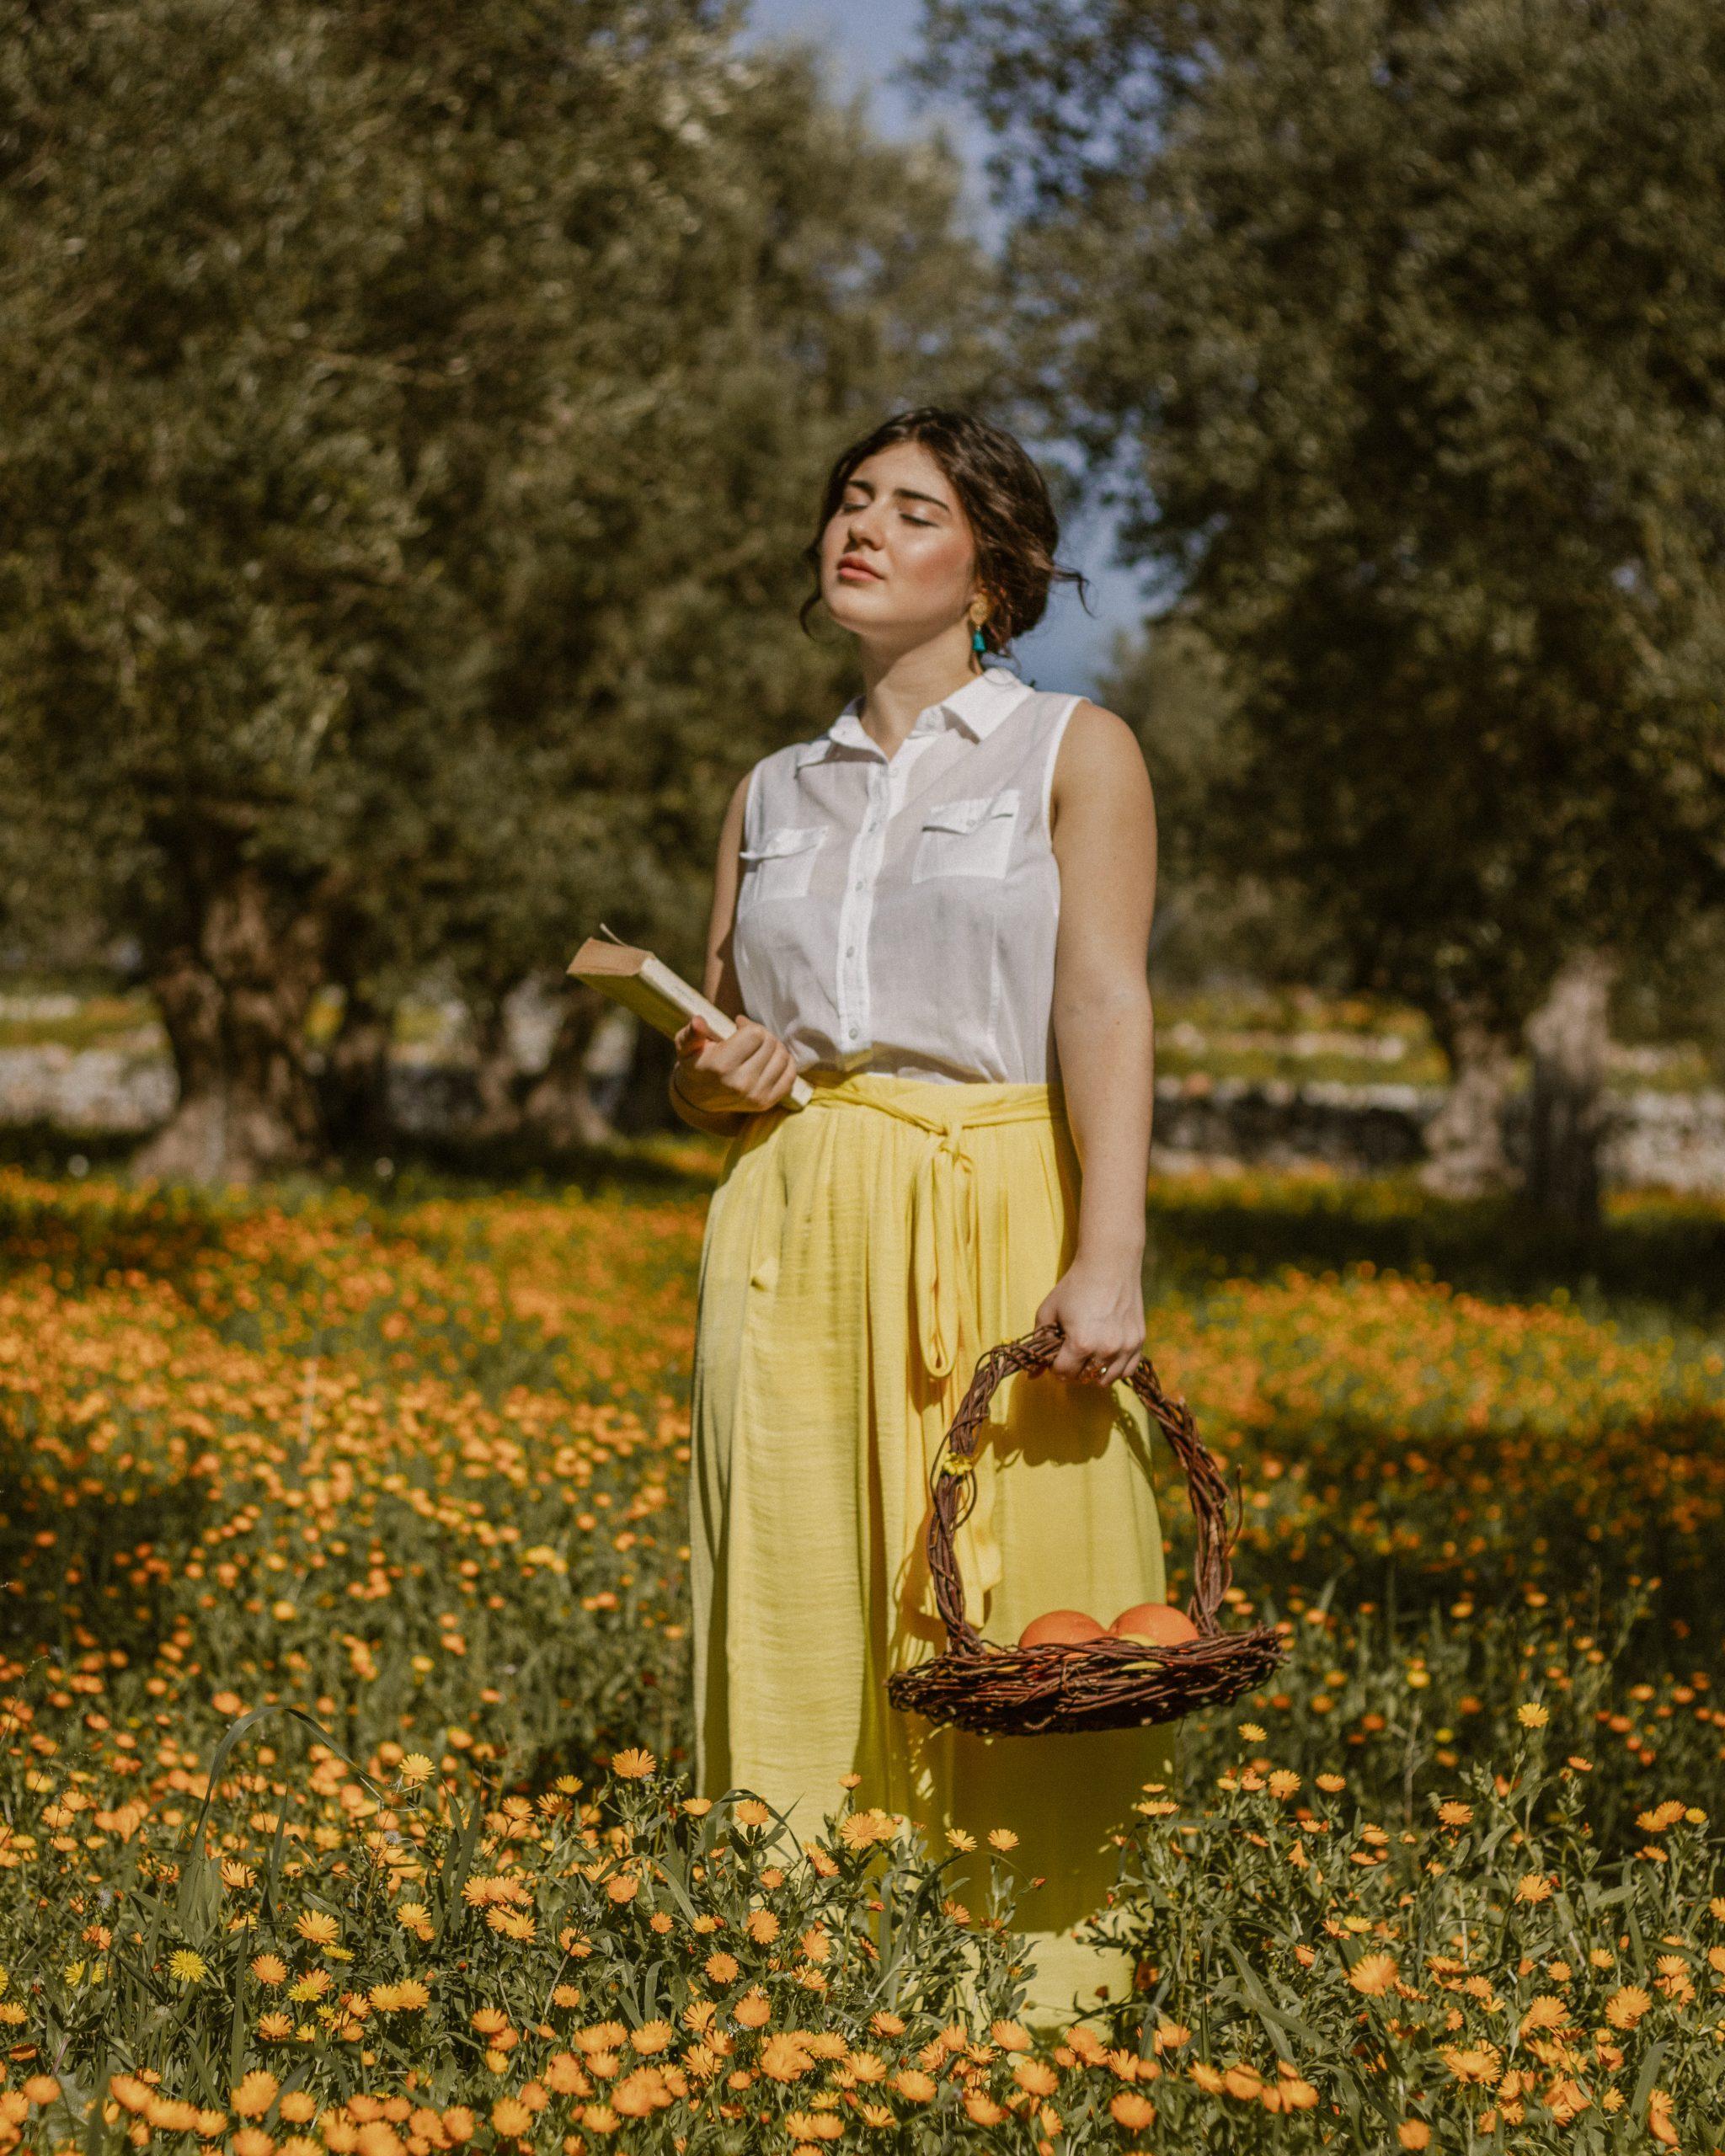 Categorie: Portrait, Glamour - Ph: ROSSELLA D'ONGHIA, Model: ERIKA D'APRILE, Mua: MARIANA CAZZOLLA -Location: Noci, BA, Italia